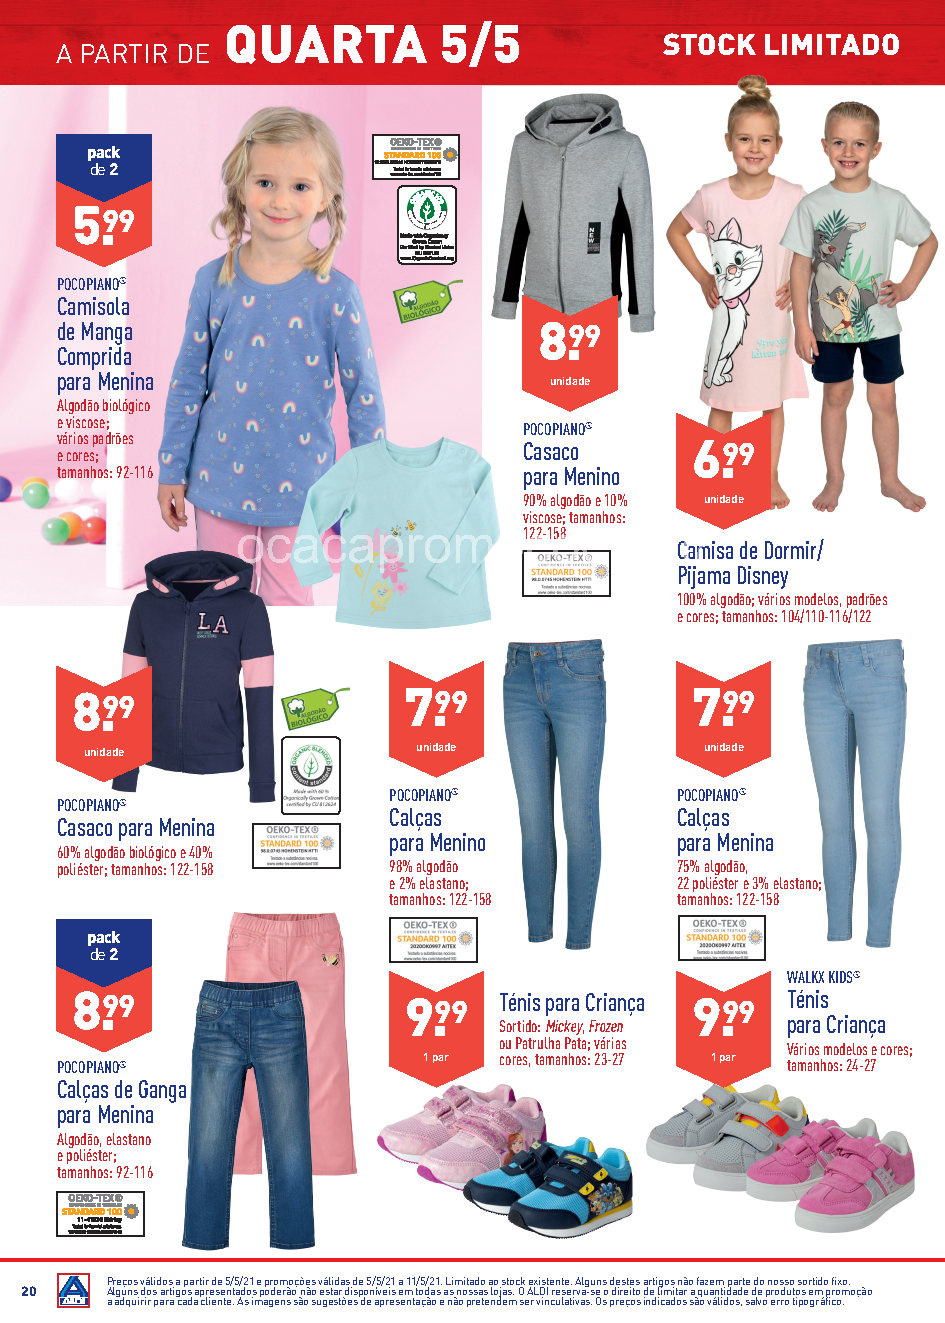 antevisao folheto aldi promocoes 5 maio Page20 1